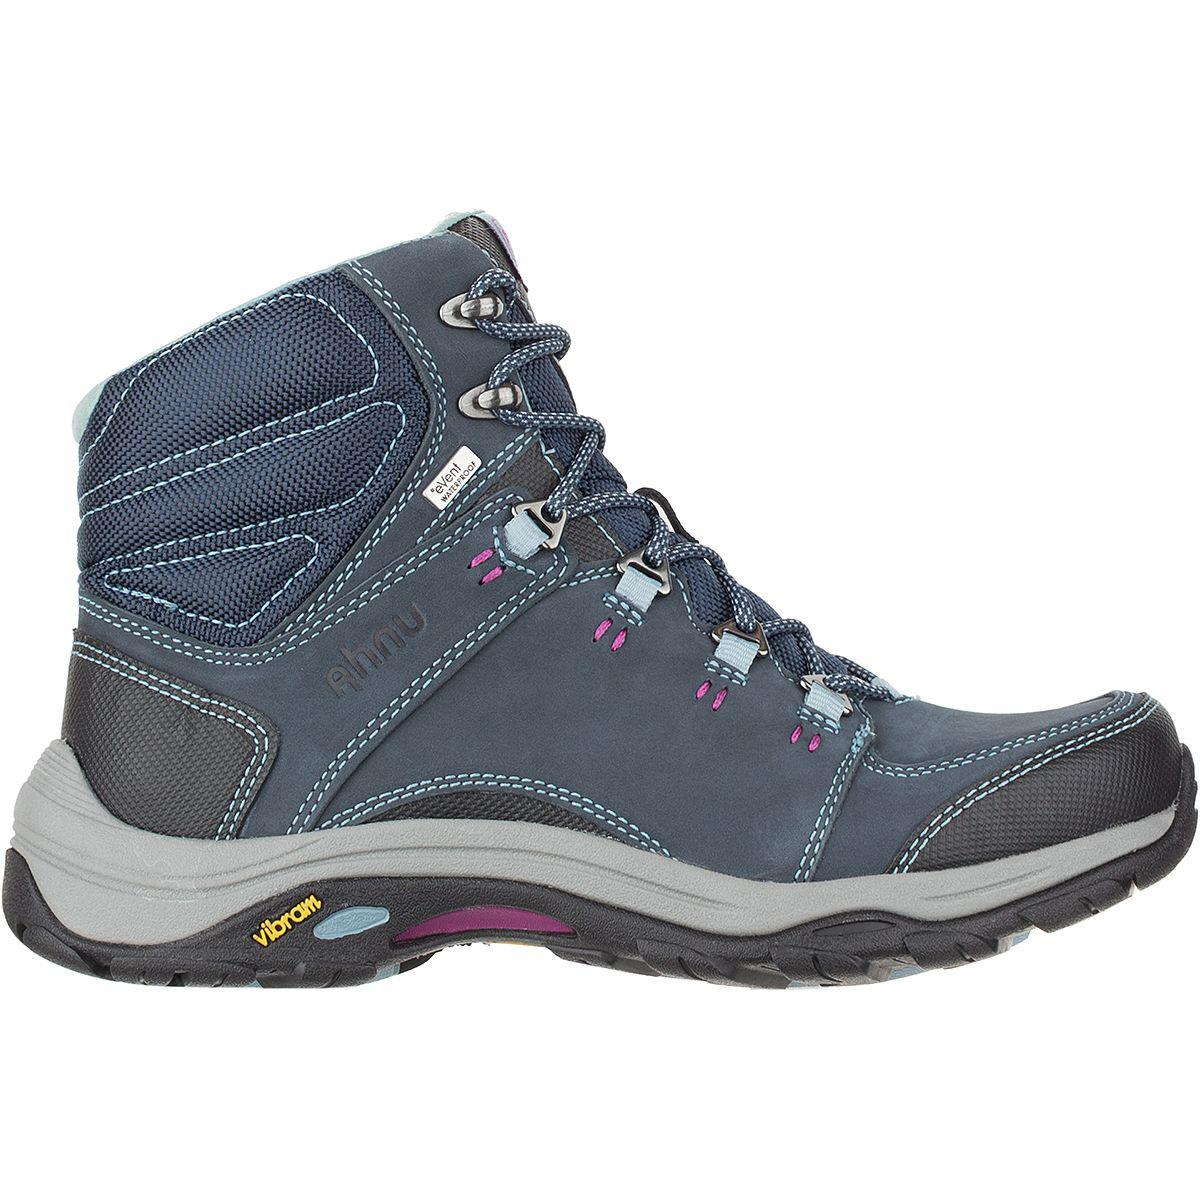 56fba7f2f3c Lyst - Ahnu Montara Iii Event Hiking Boot in Blue for Men